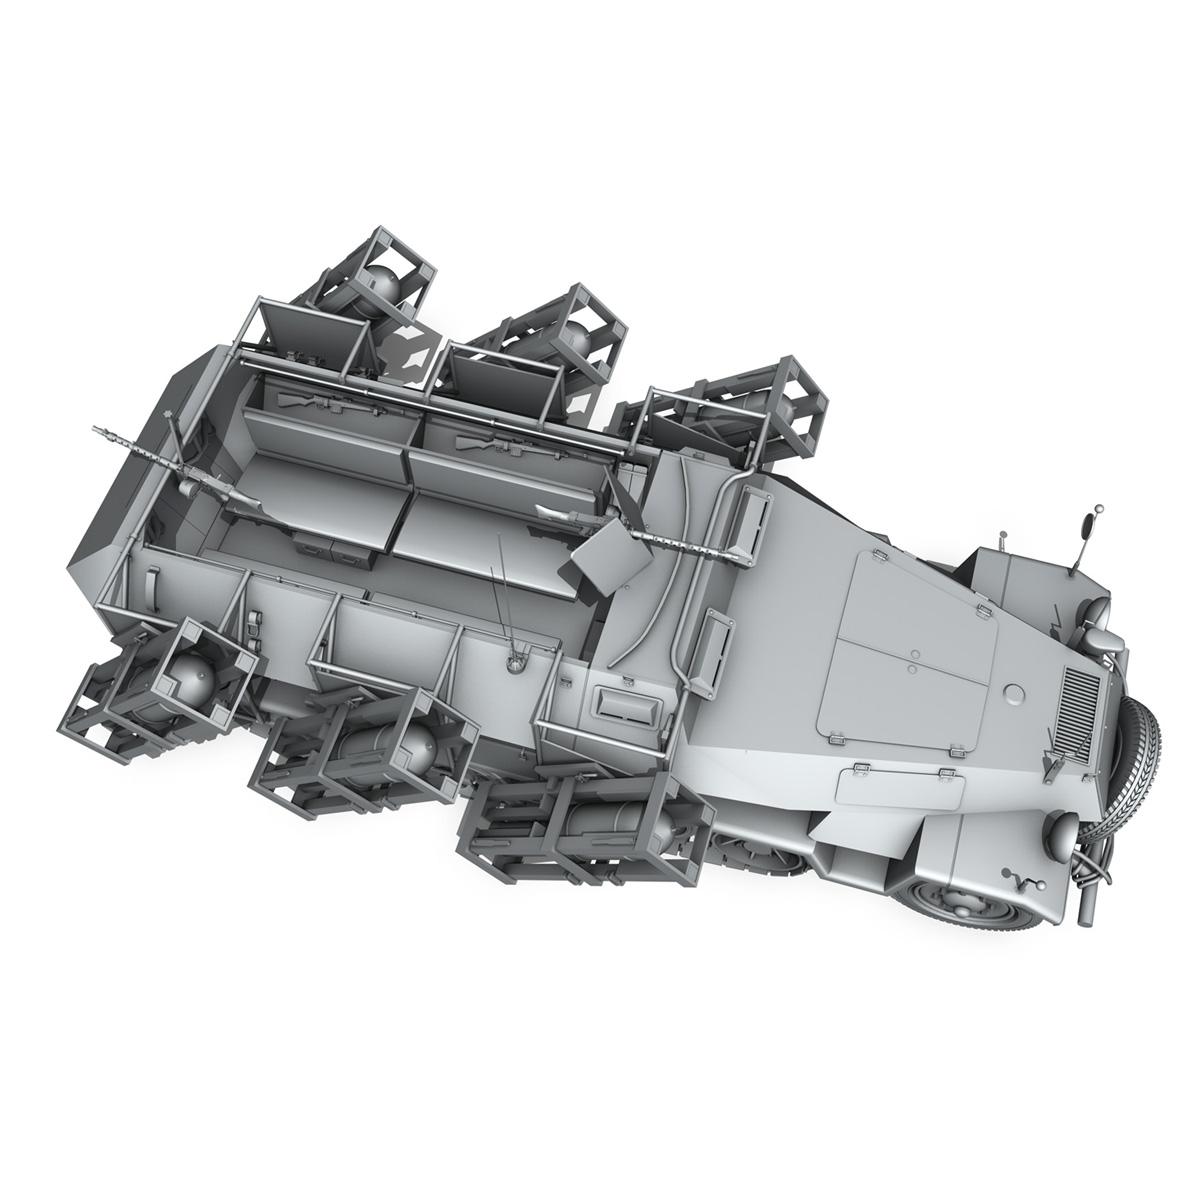 sdkfz 251 ausf.b – ground stuka 3d model 3ds fbx c4d lwo obj 251686